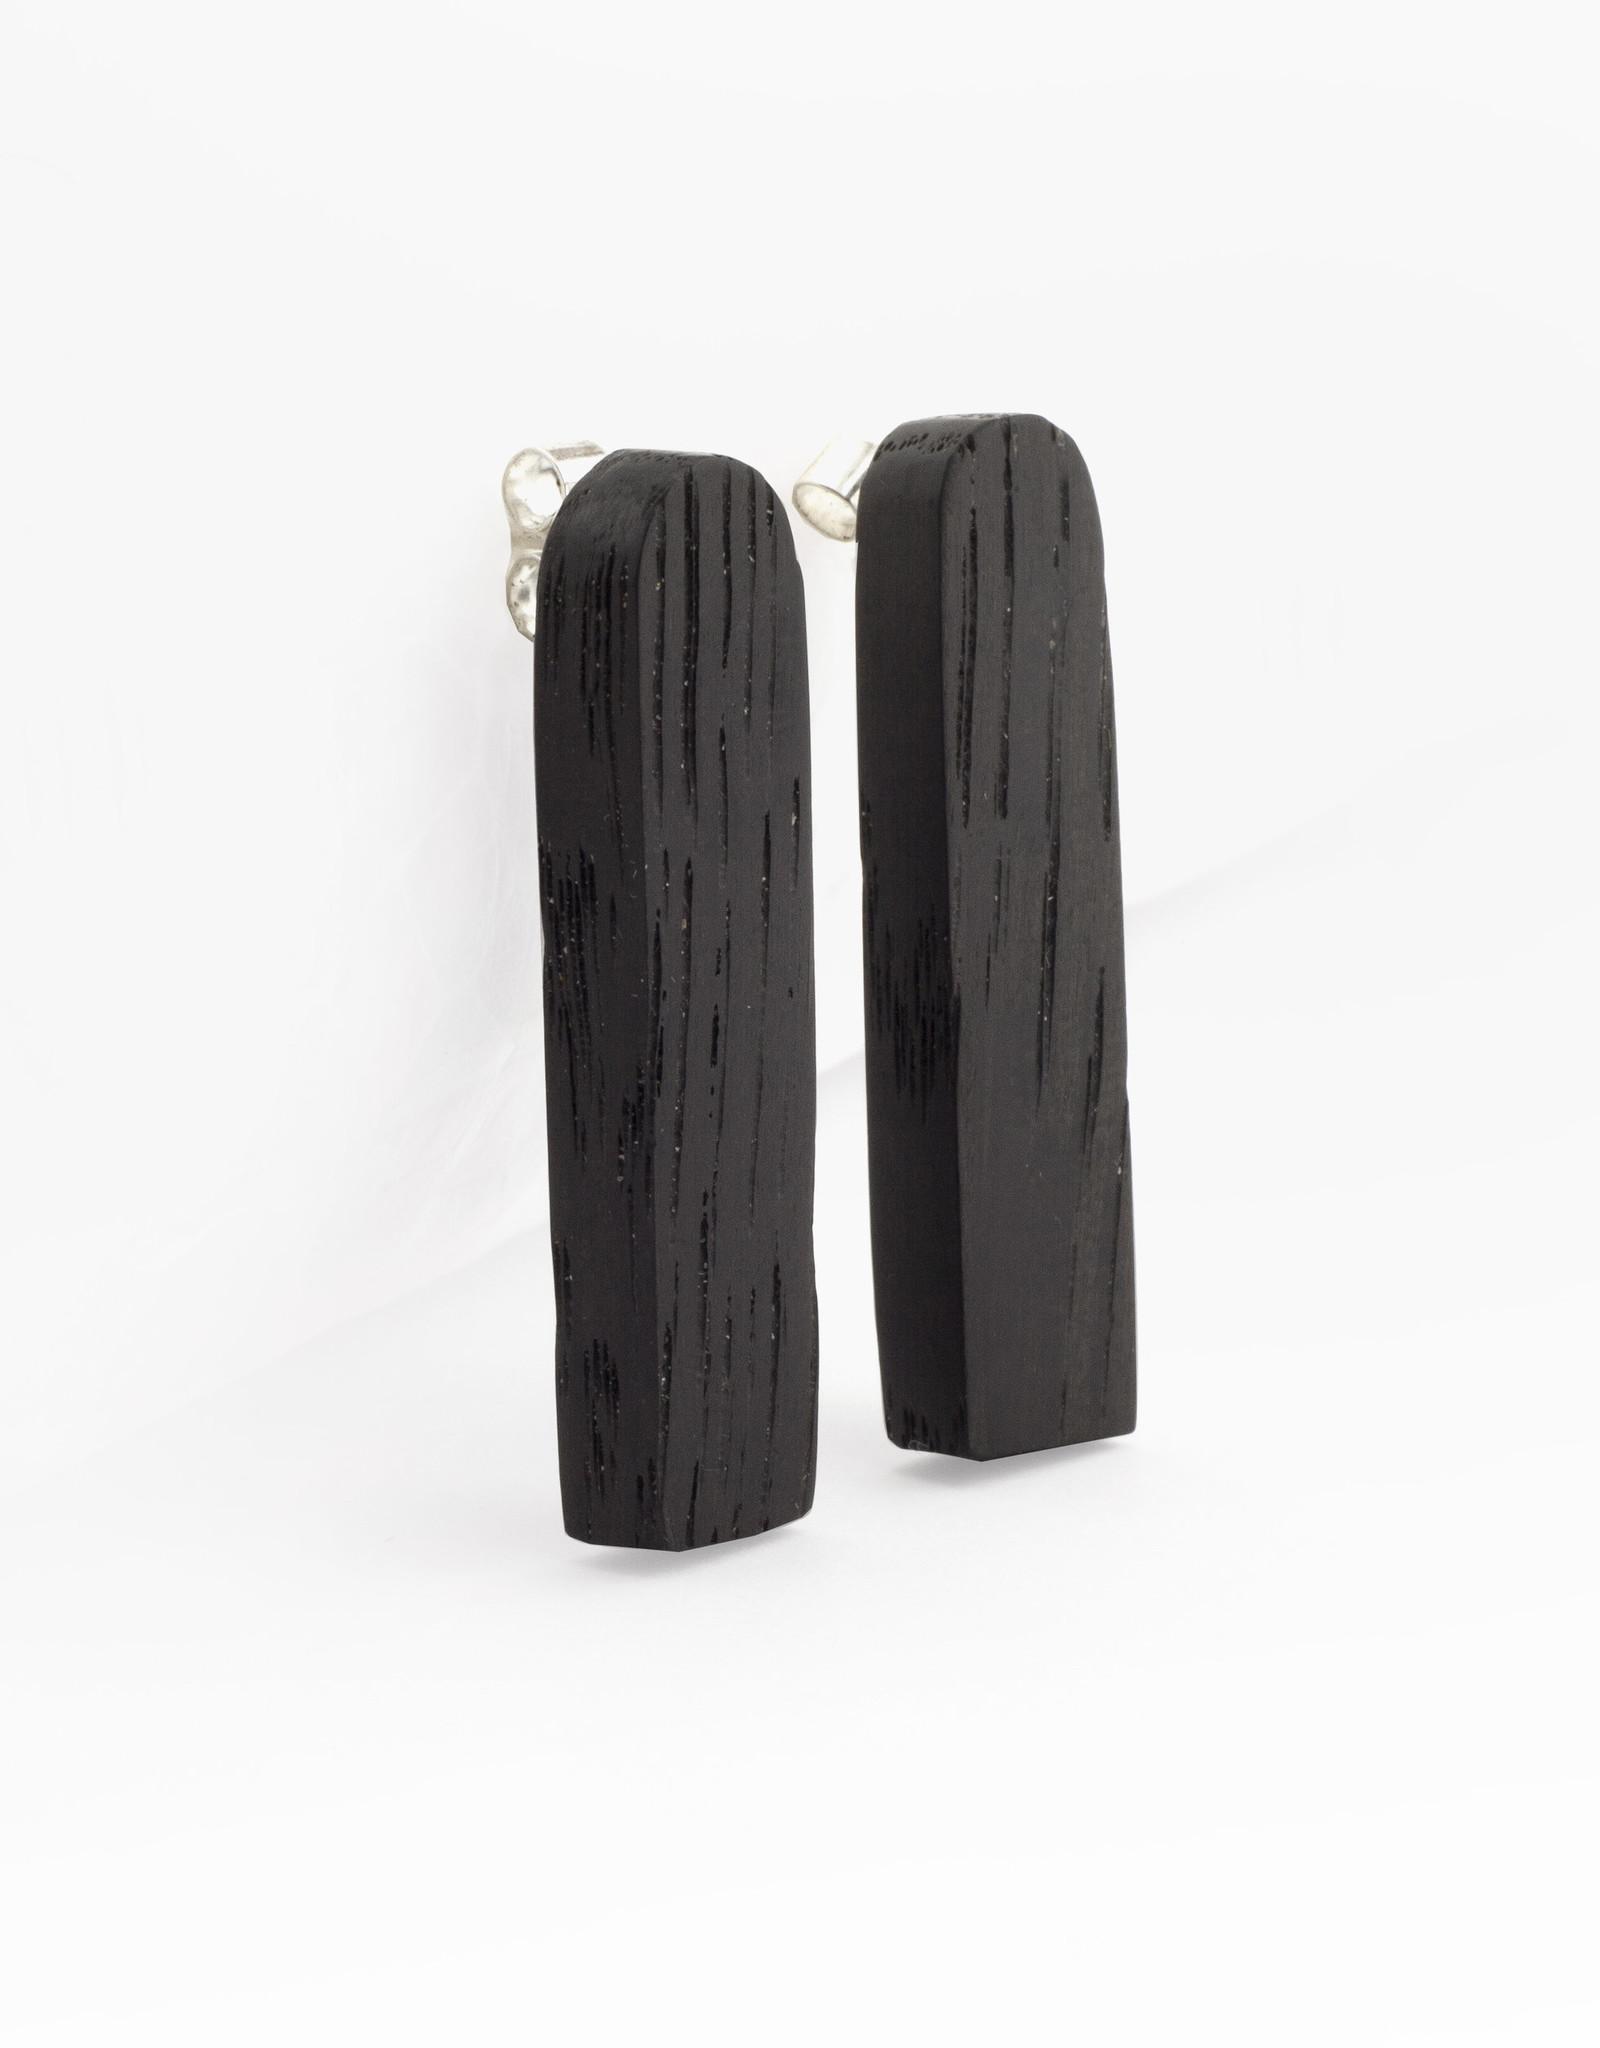 Leko & Leko Jewellery Leko & Leko - Sonder